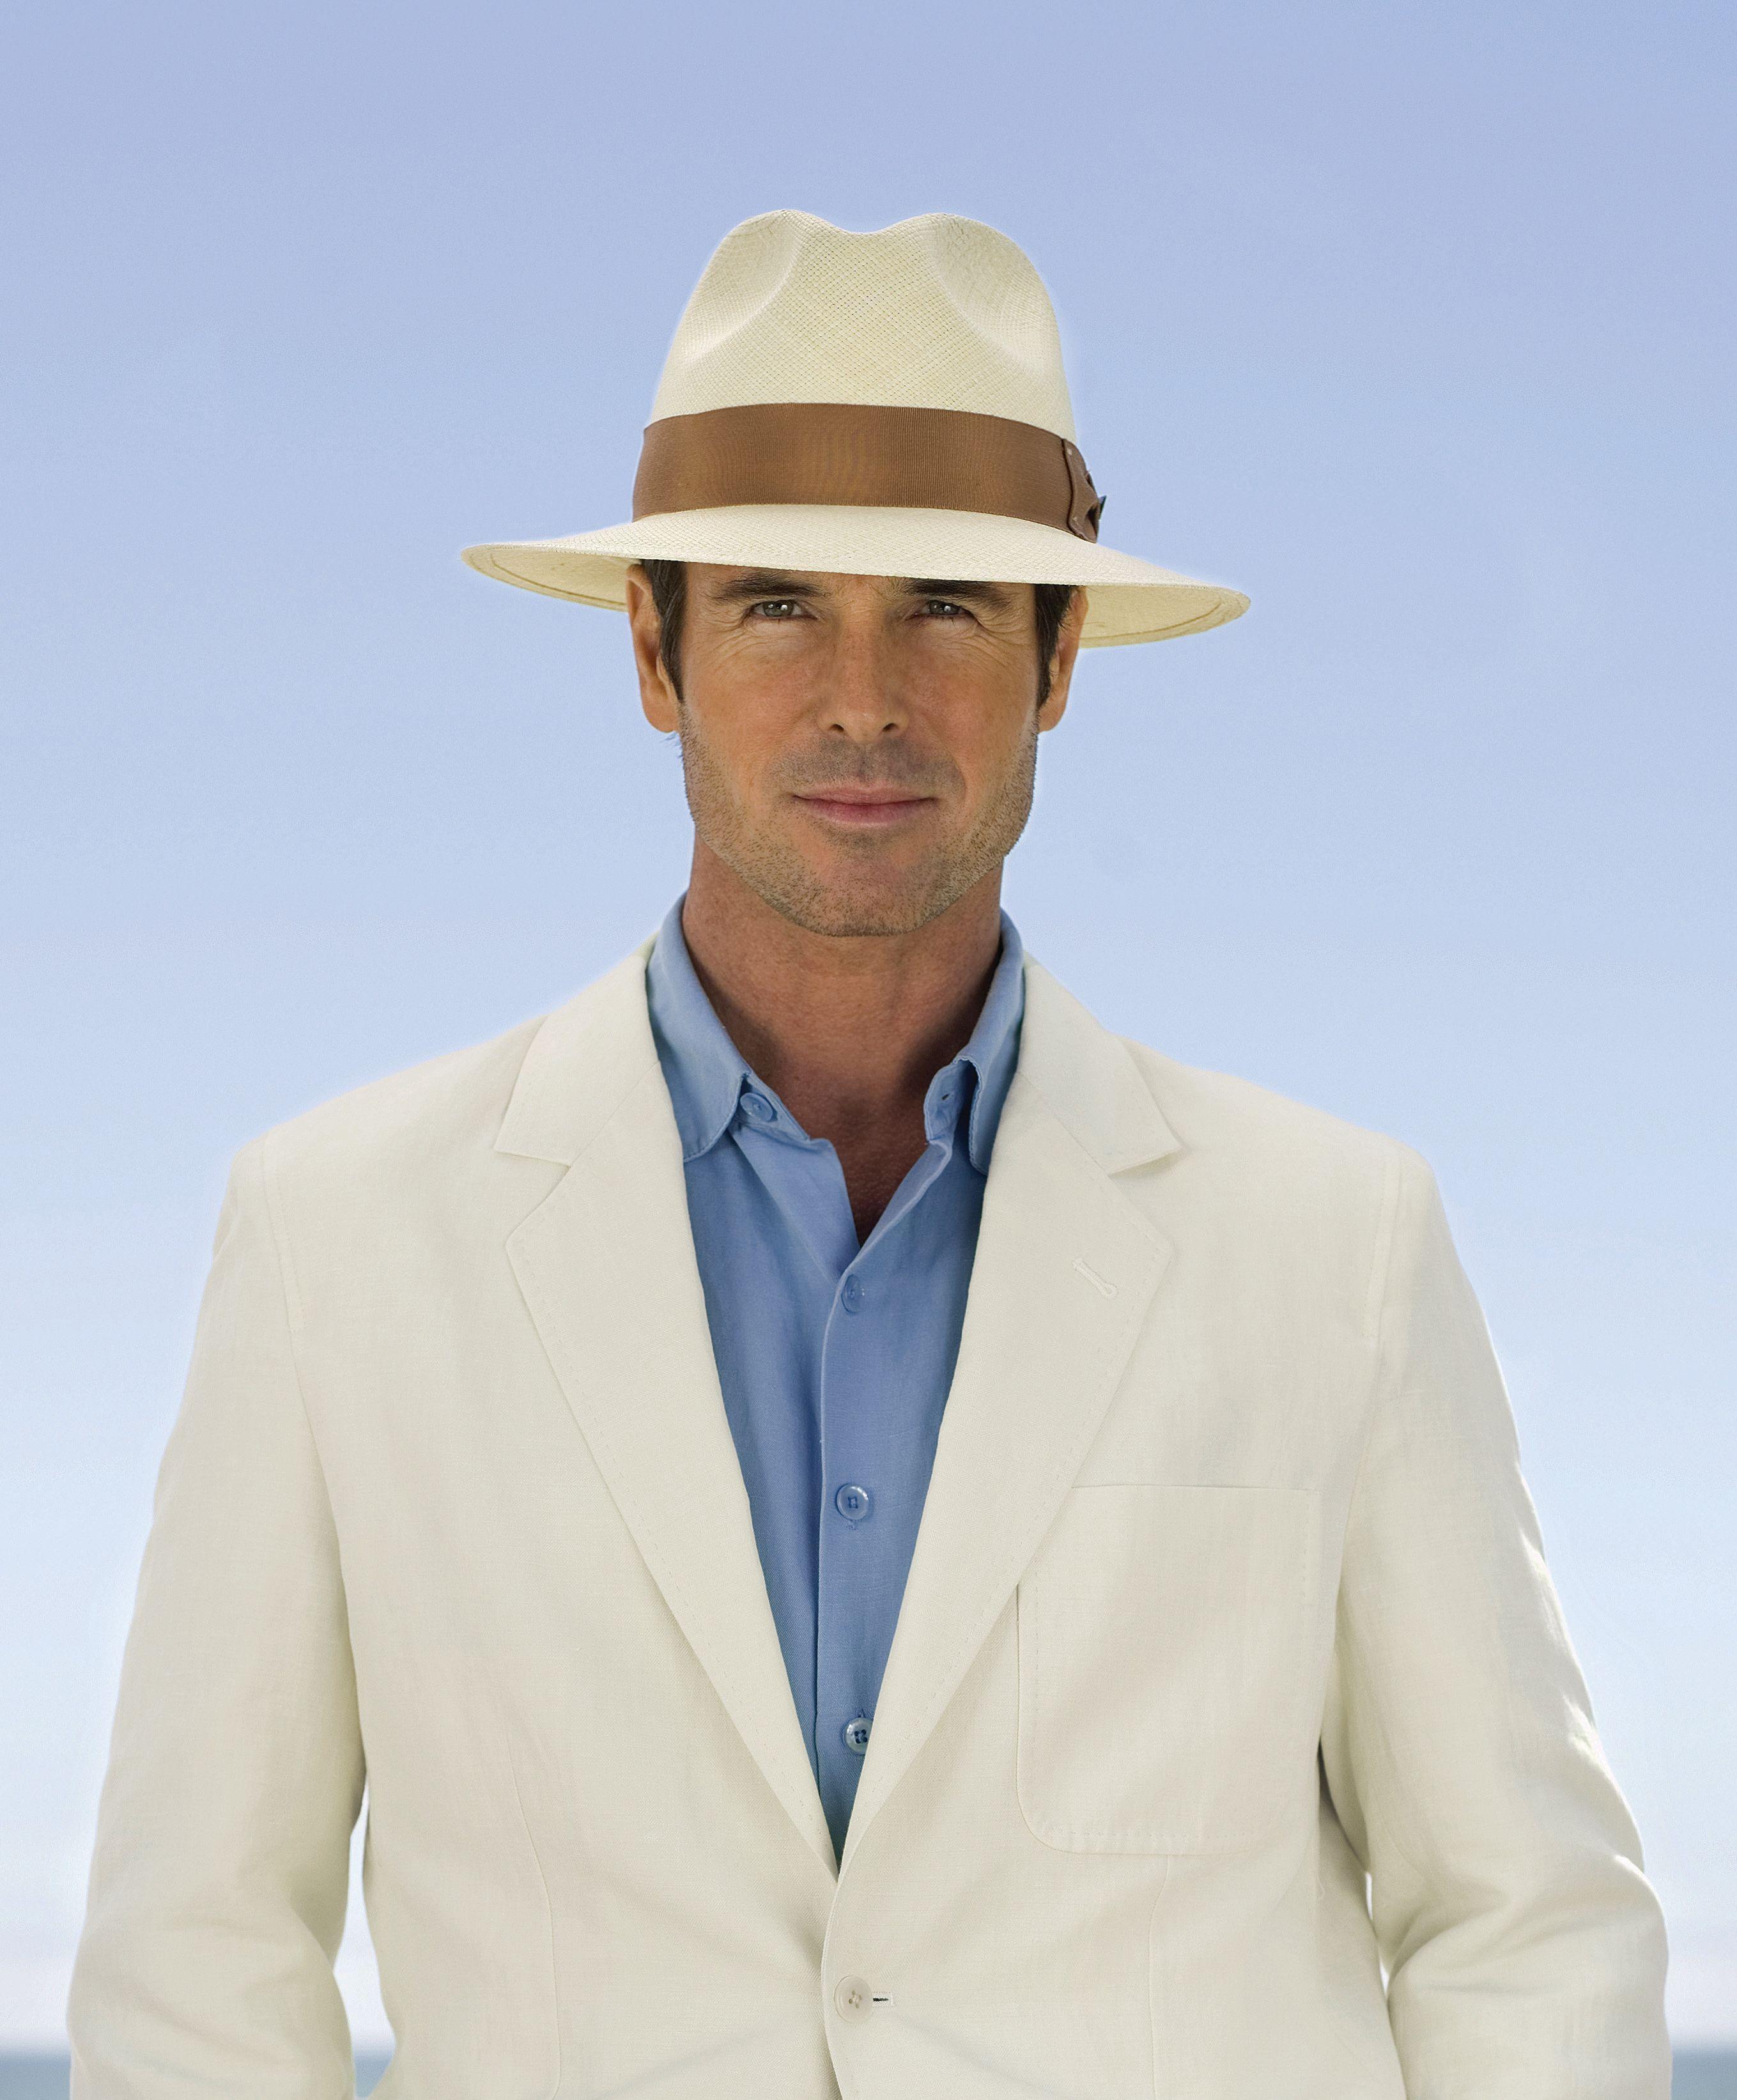 05494c936 Scala Hats Panama Safari Hat  On sale today!, Ships free on $40 ...